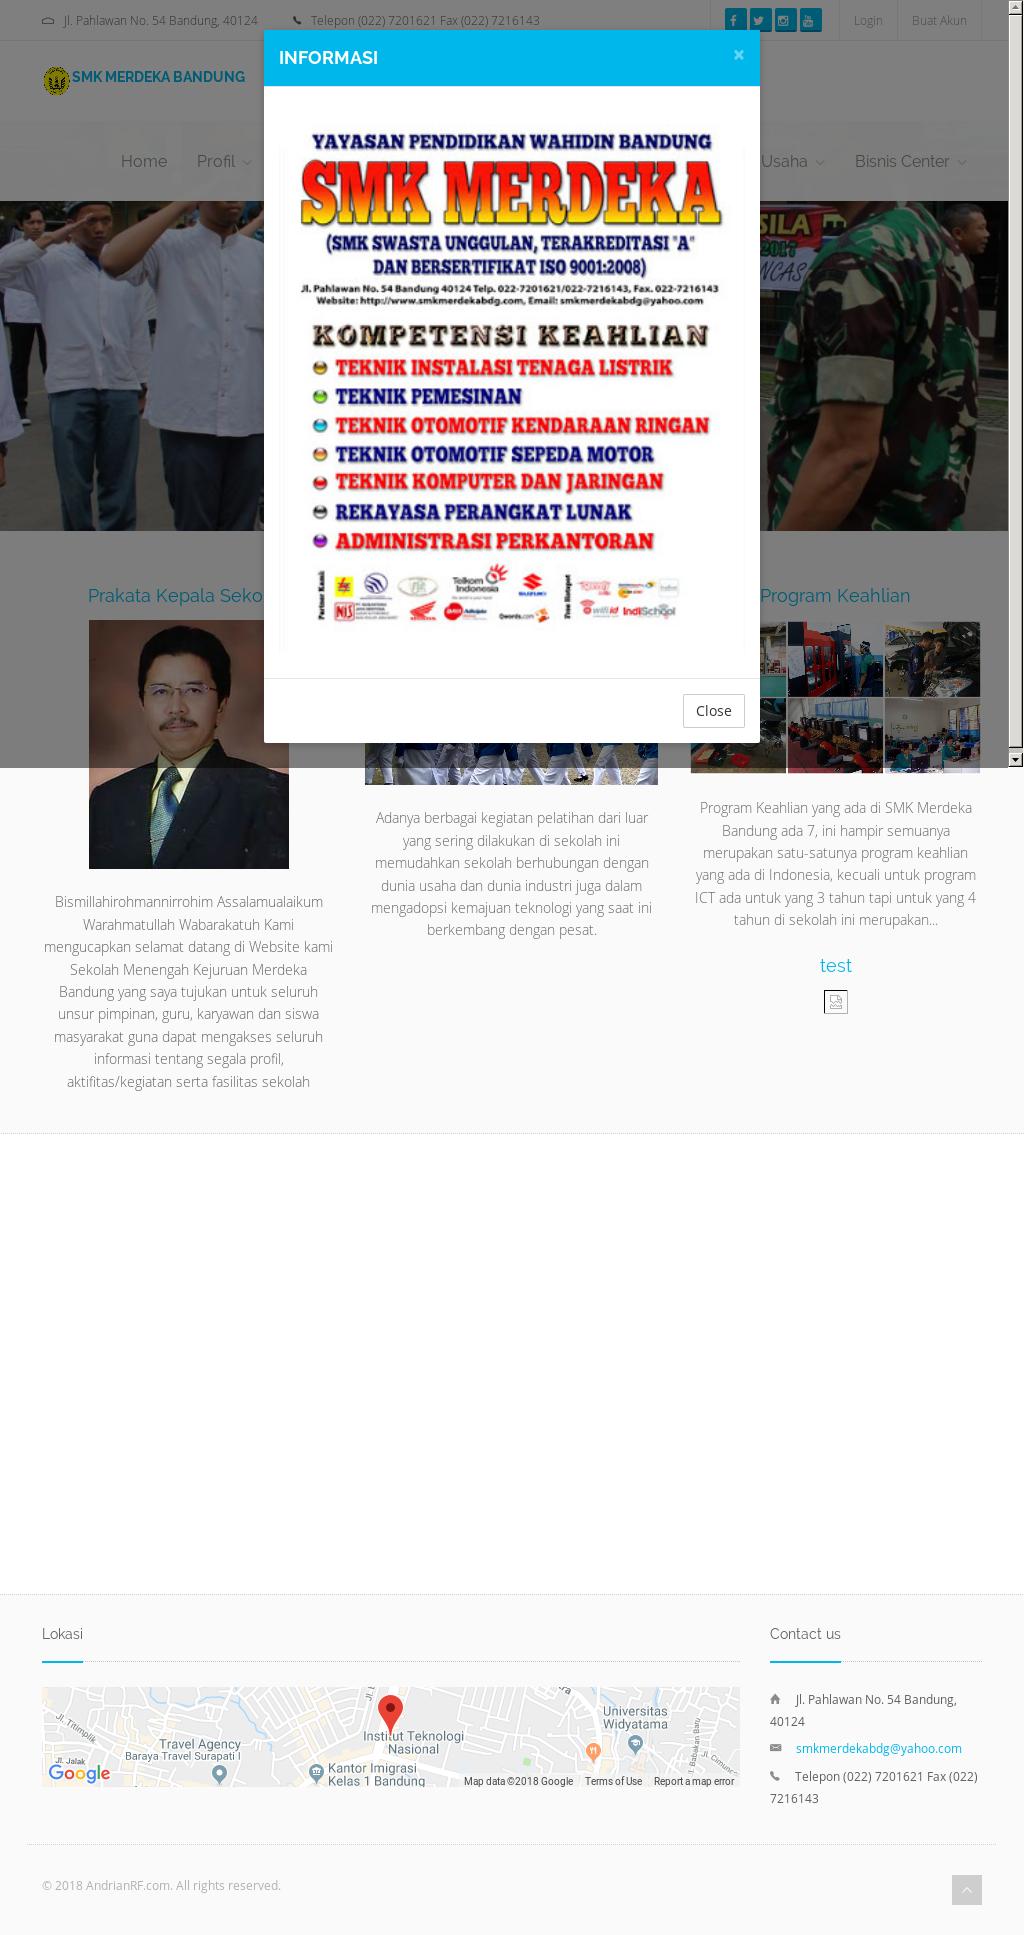 Smk merdeka bandung competitors revenue and employees owler smk merdeka bandung website history ccuart Image collections